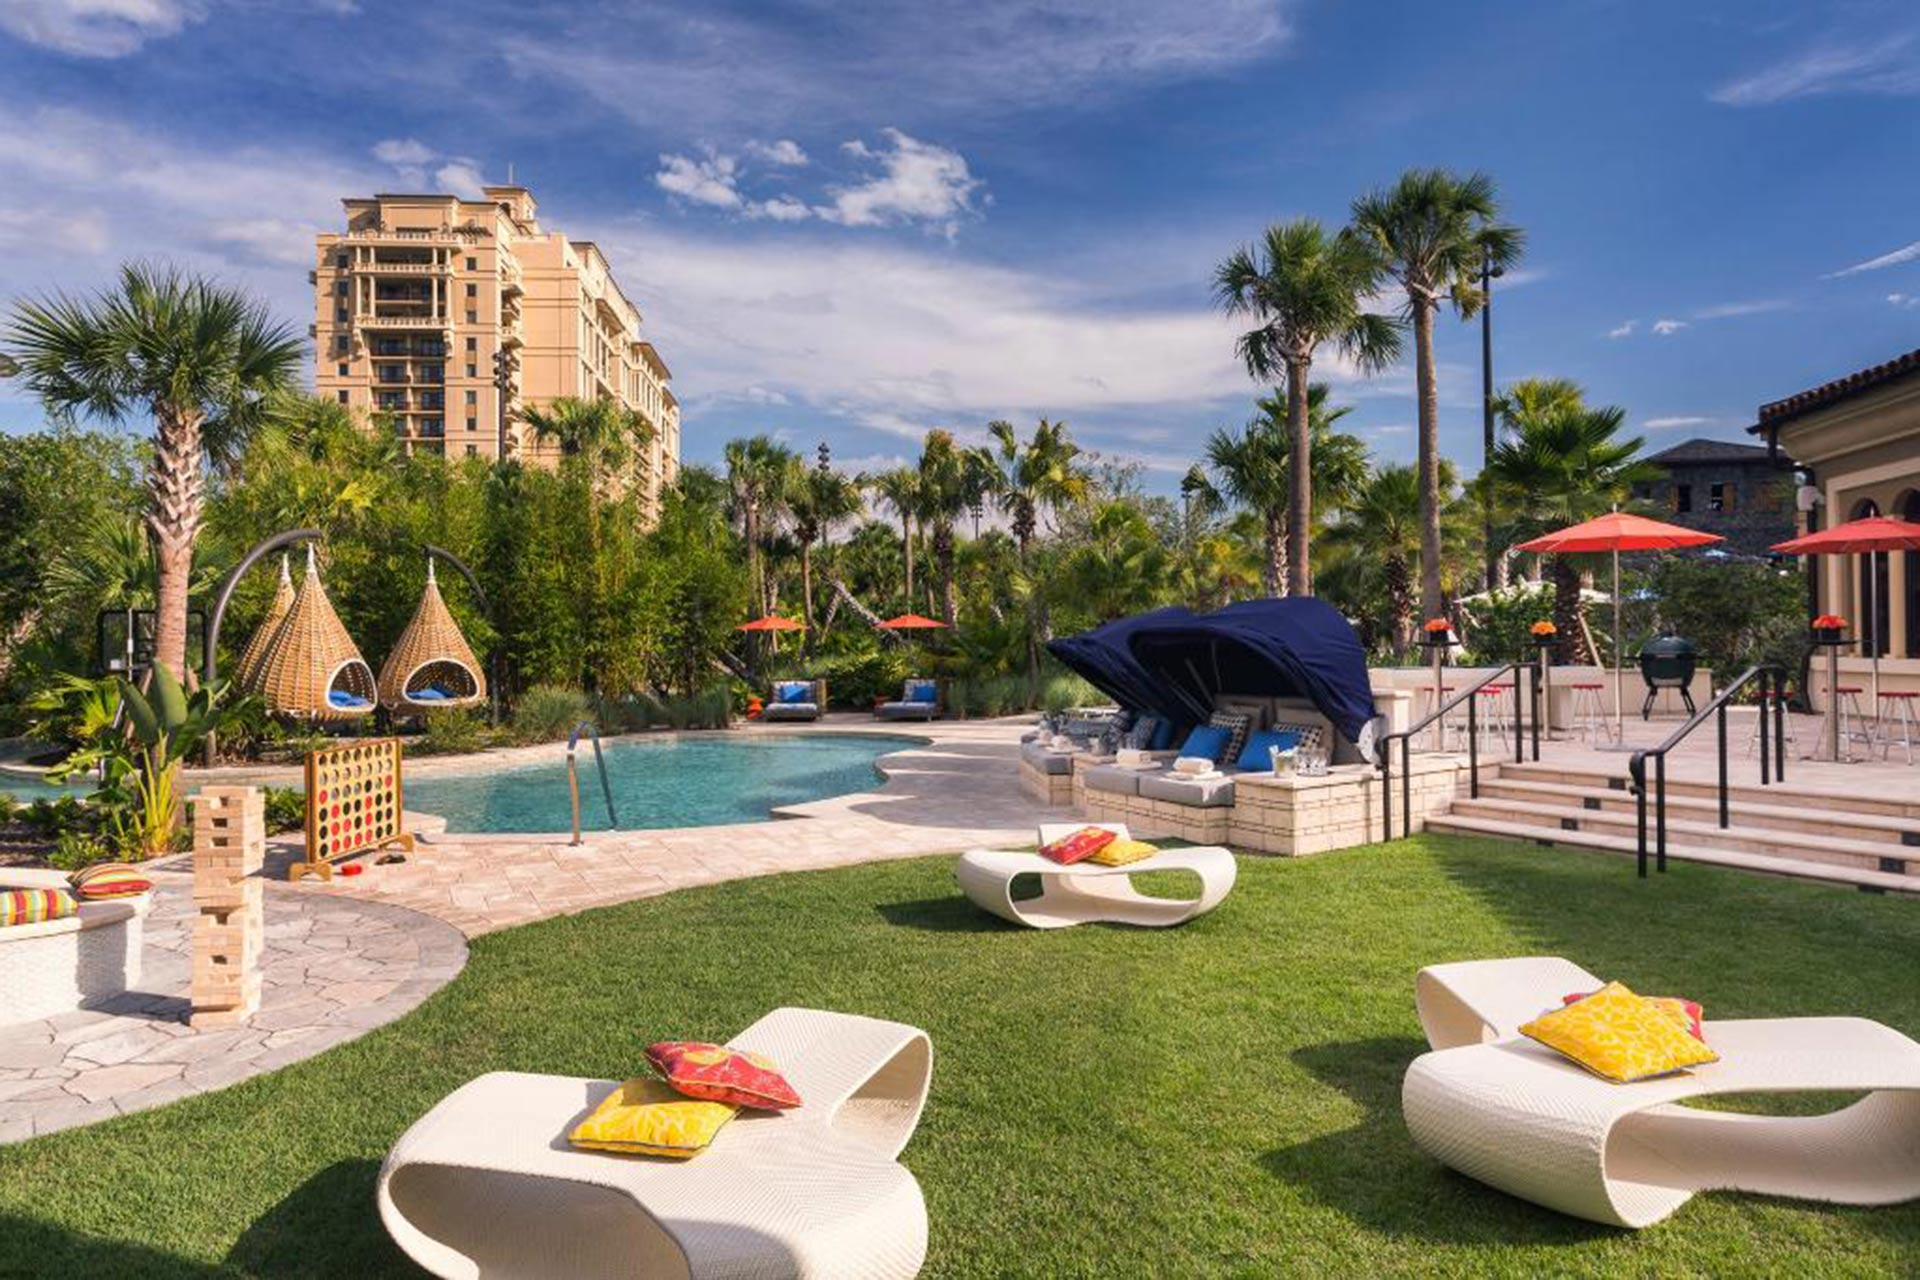 Four Seasons Resort Orlando at Walt Disney World Resort in Florida